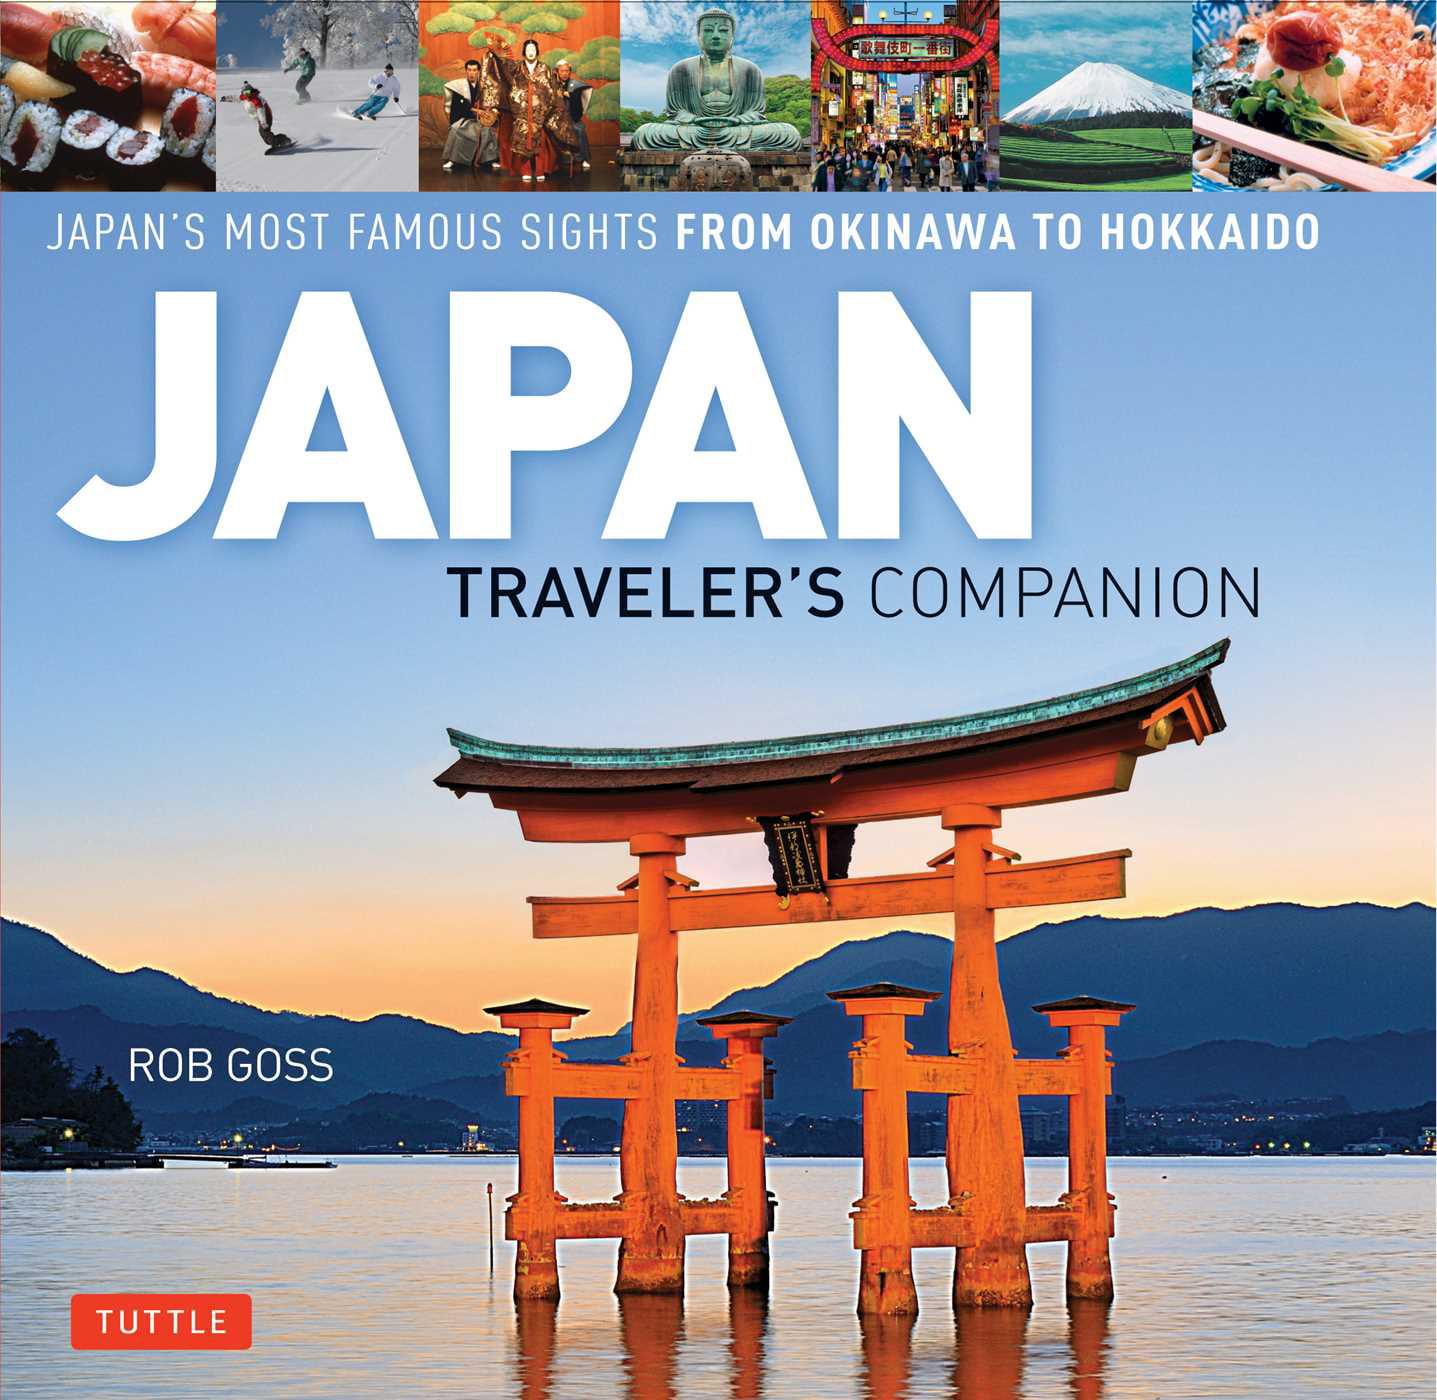 Japan Traveler's Companion : Japan's Most Famous Sights From Okinawa to Hokkaido - Hardcover